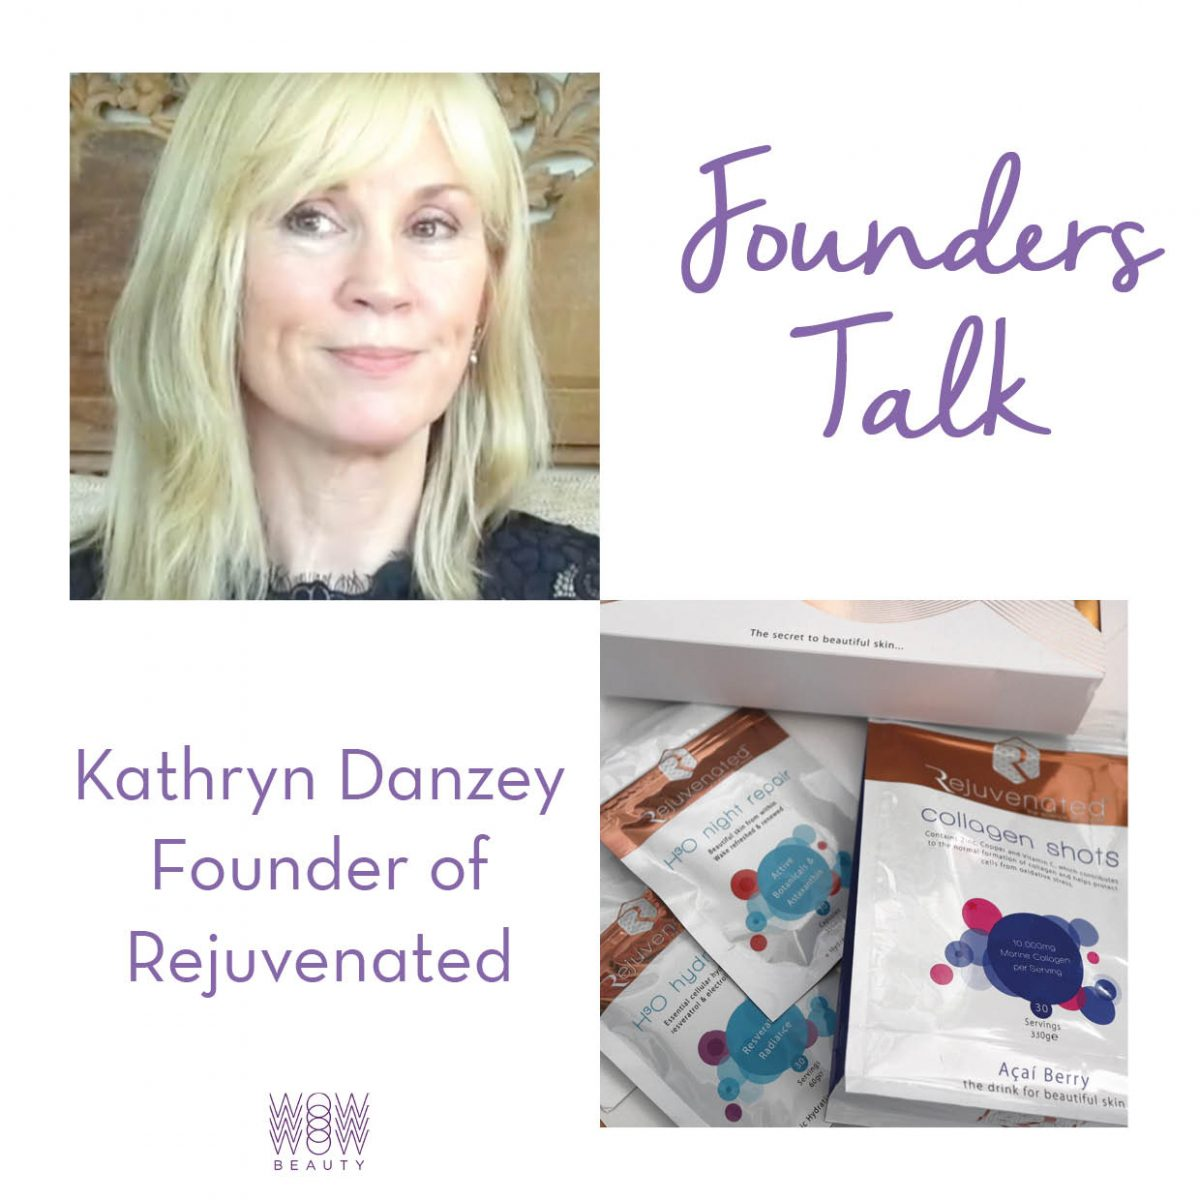 Kathryn Danzey founders talk